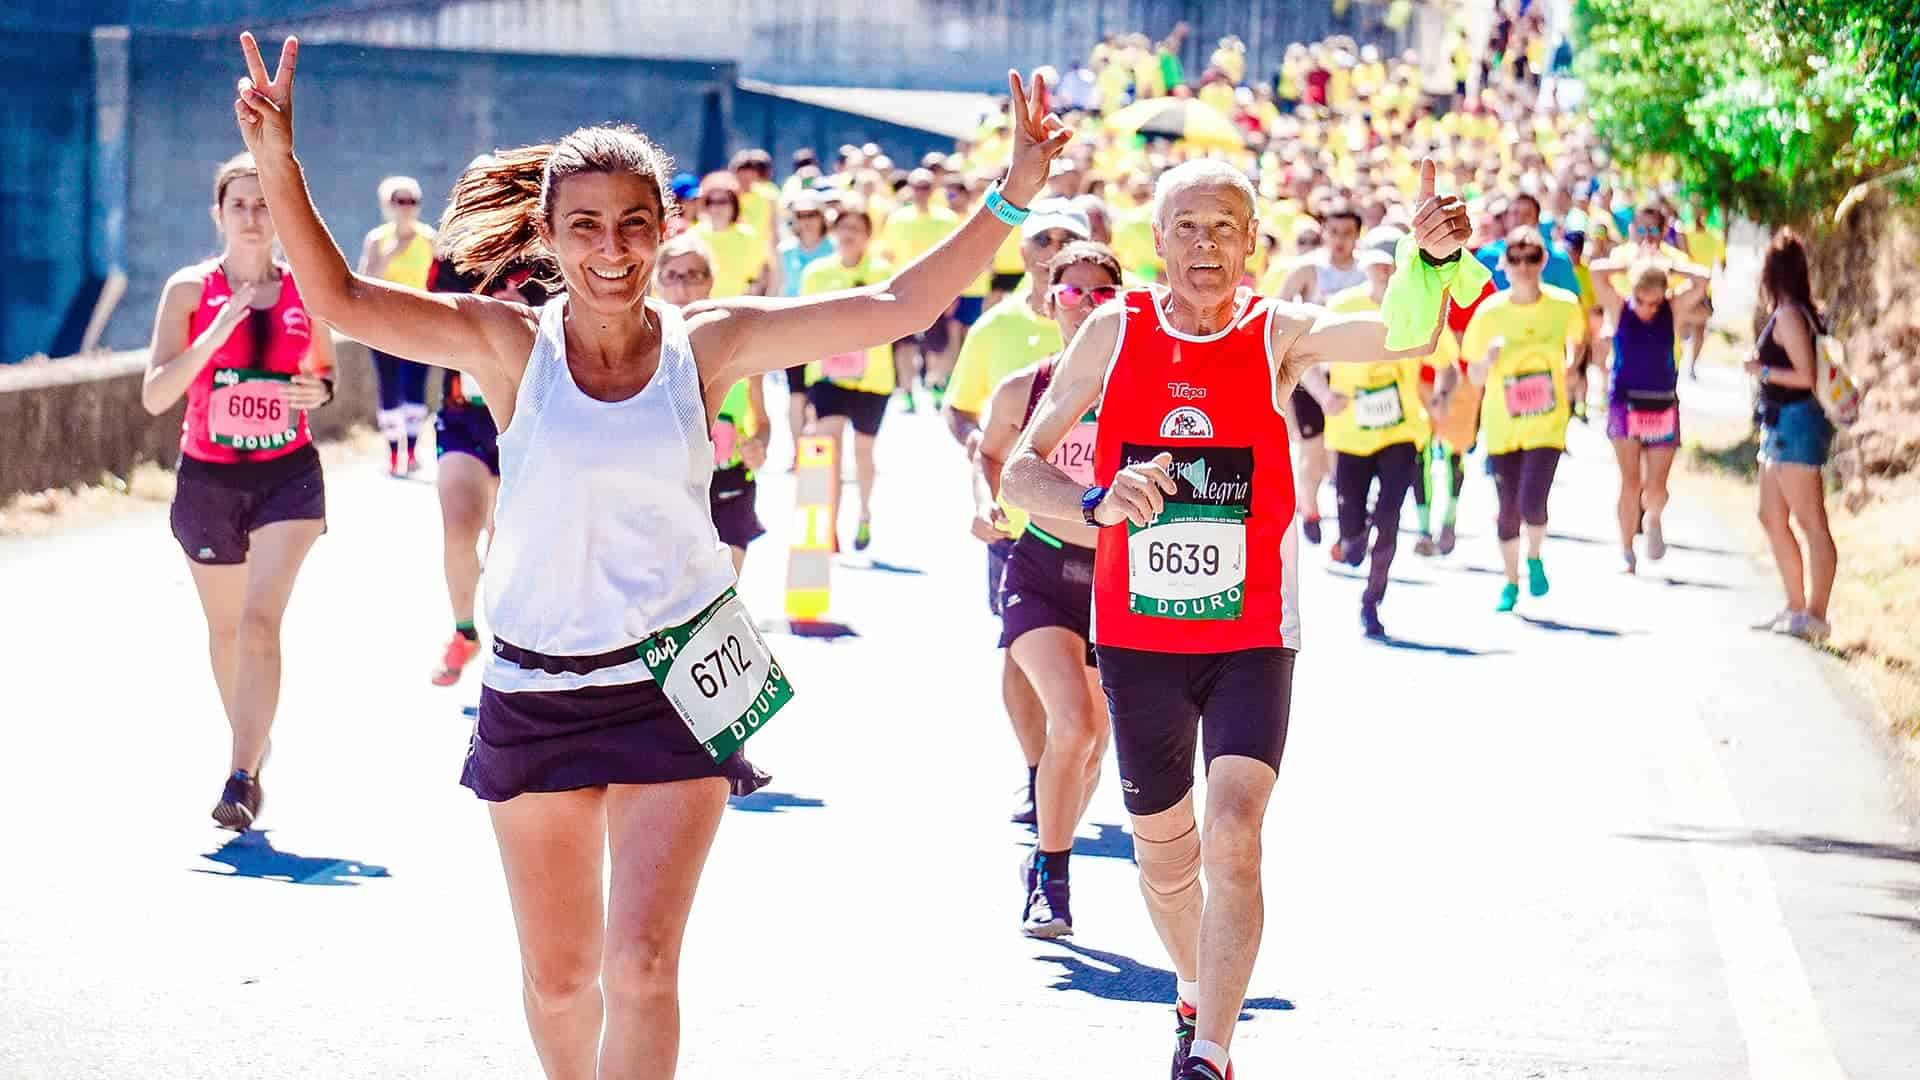 Runner's high, euphoria and the Endocannabinoid System